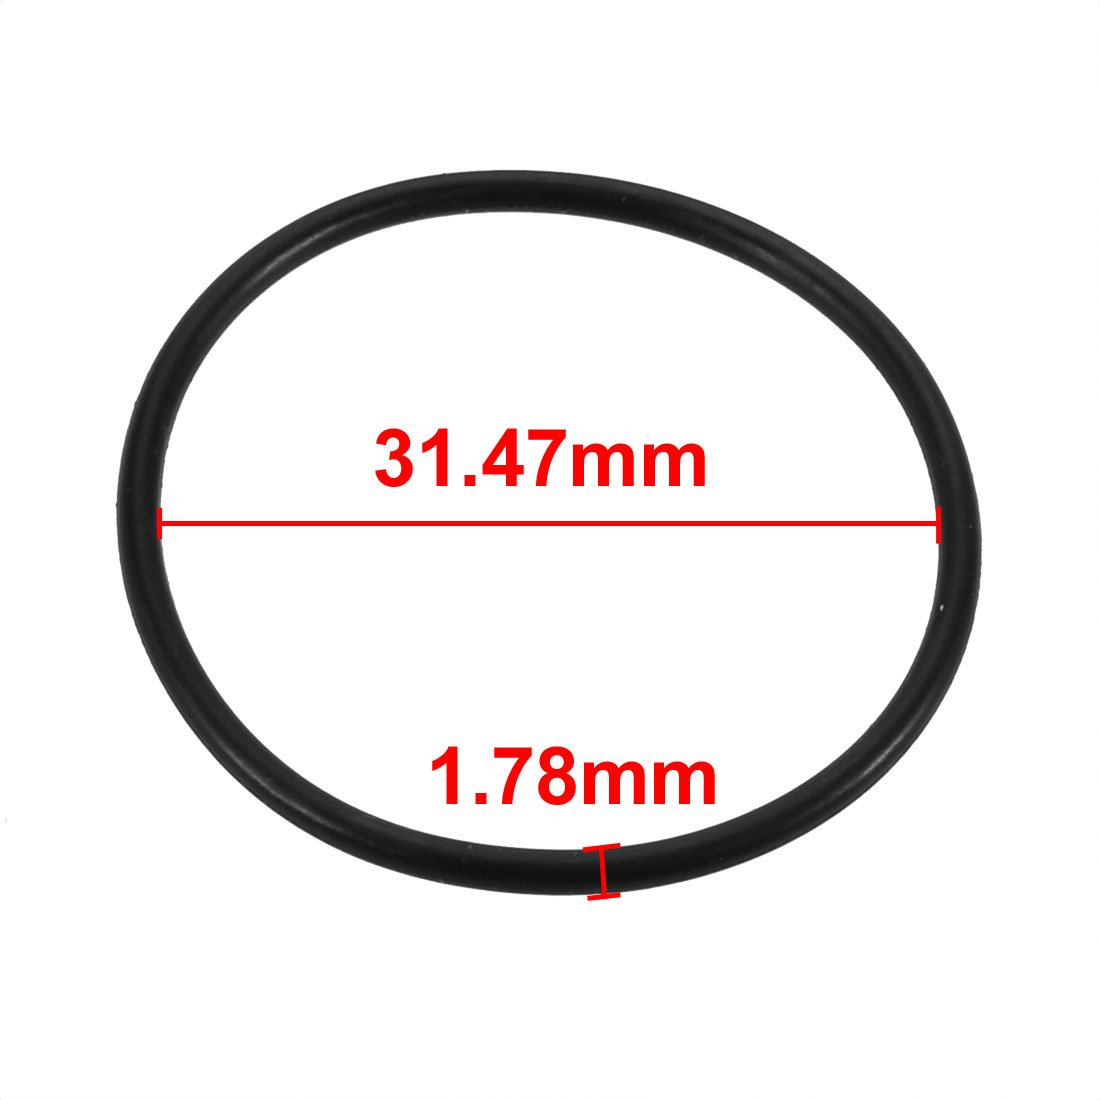 schwarz Nitril Butadien Gummi NBR O-Ring 31.47mm Inner Dmr sourcing map 20Stk 1.78mm Breite